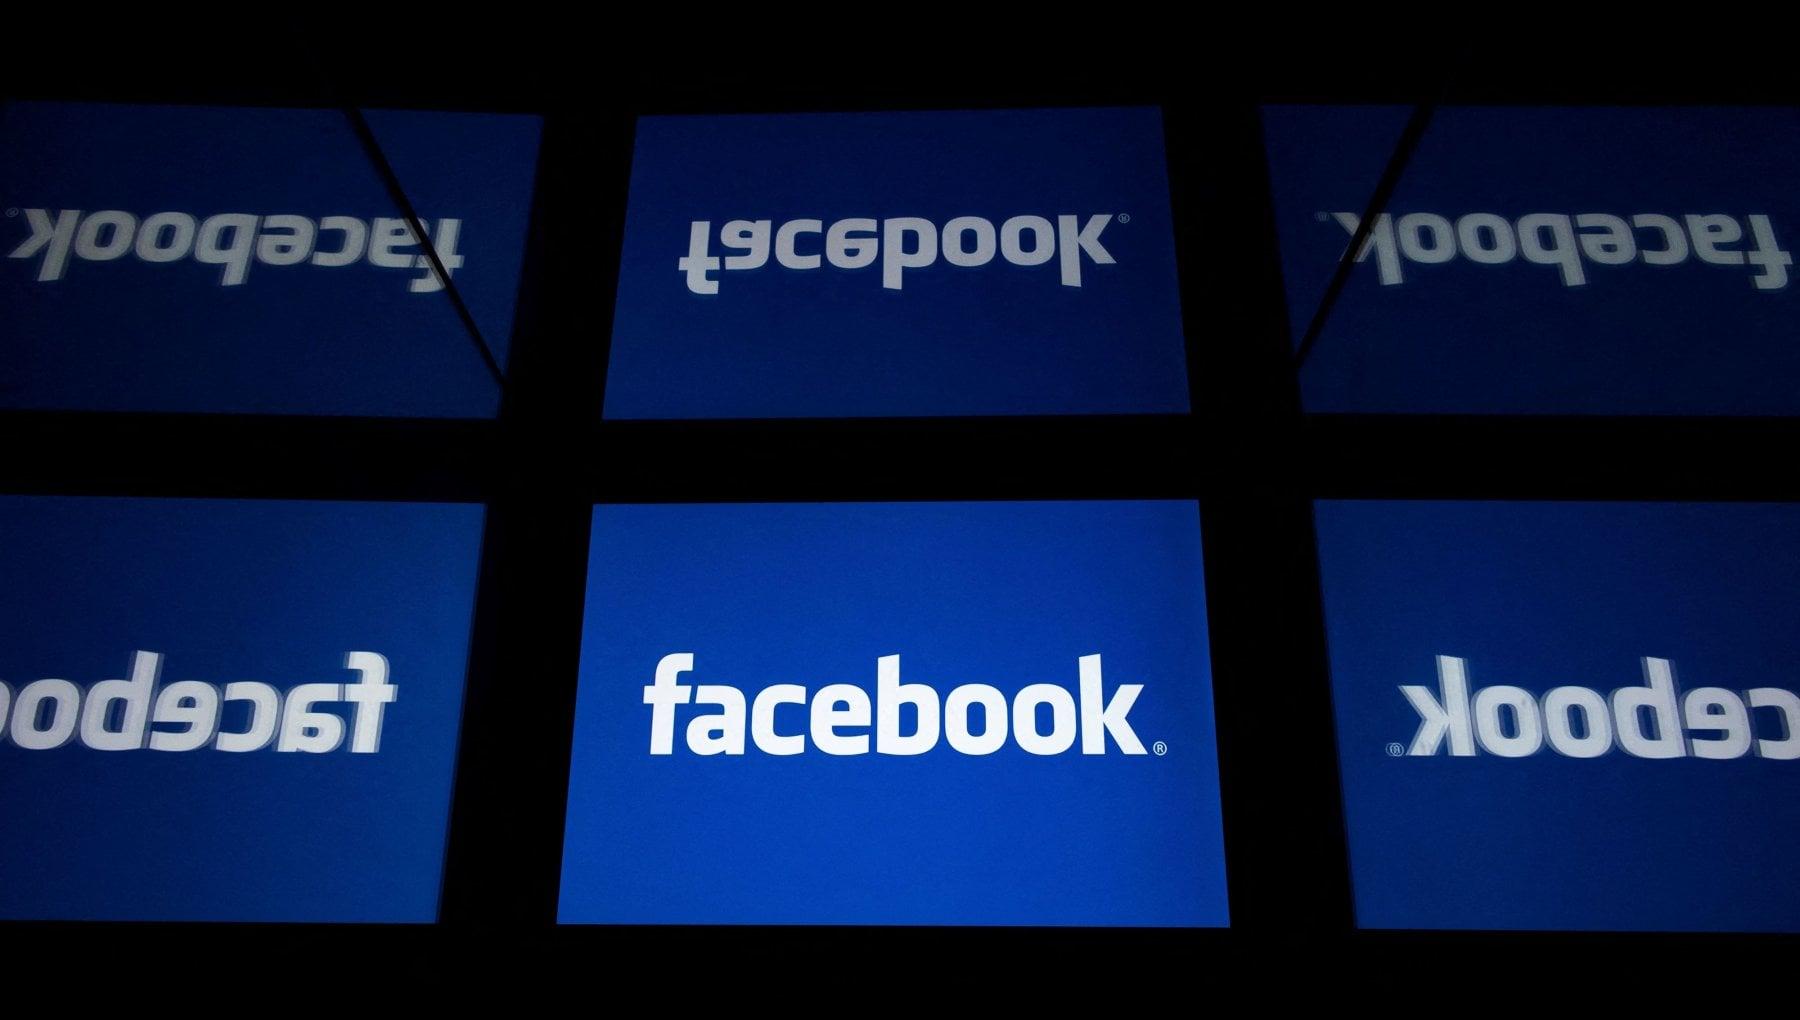 Facebook intalnire unica gratuita